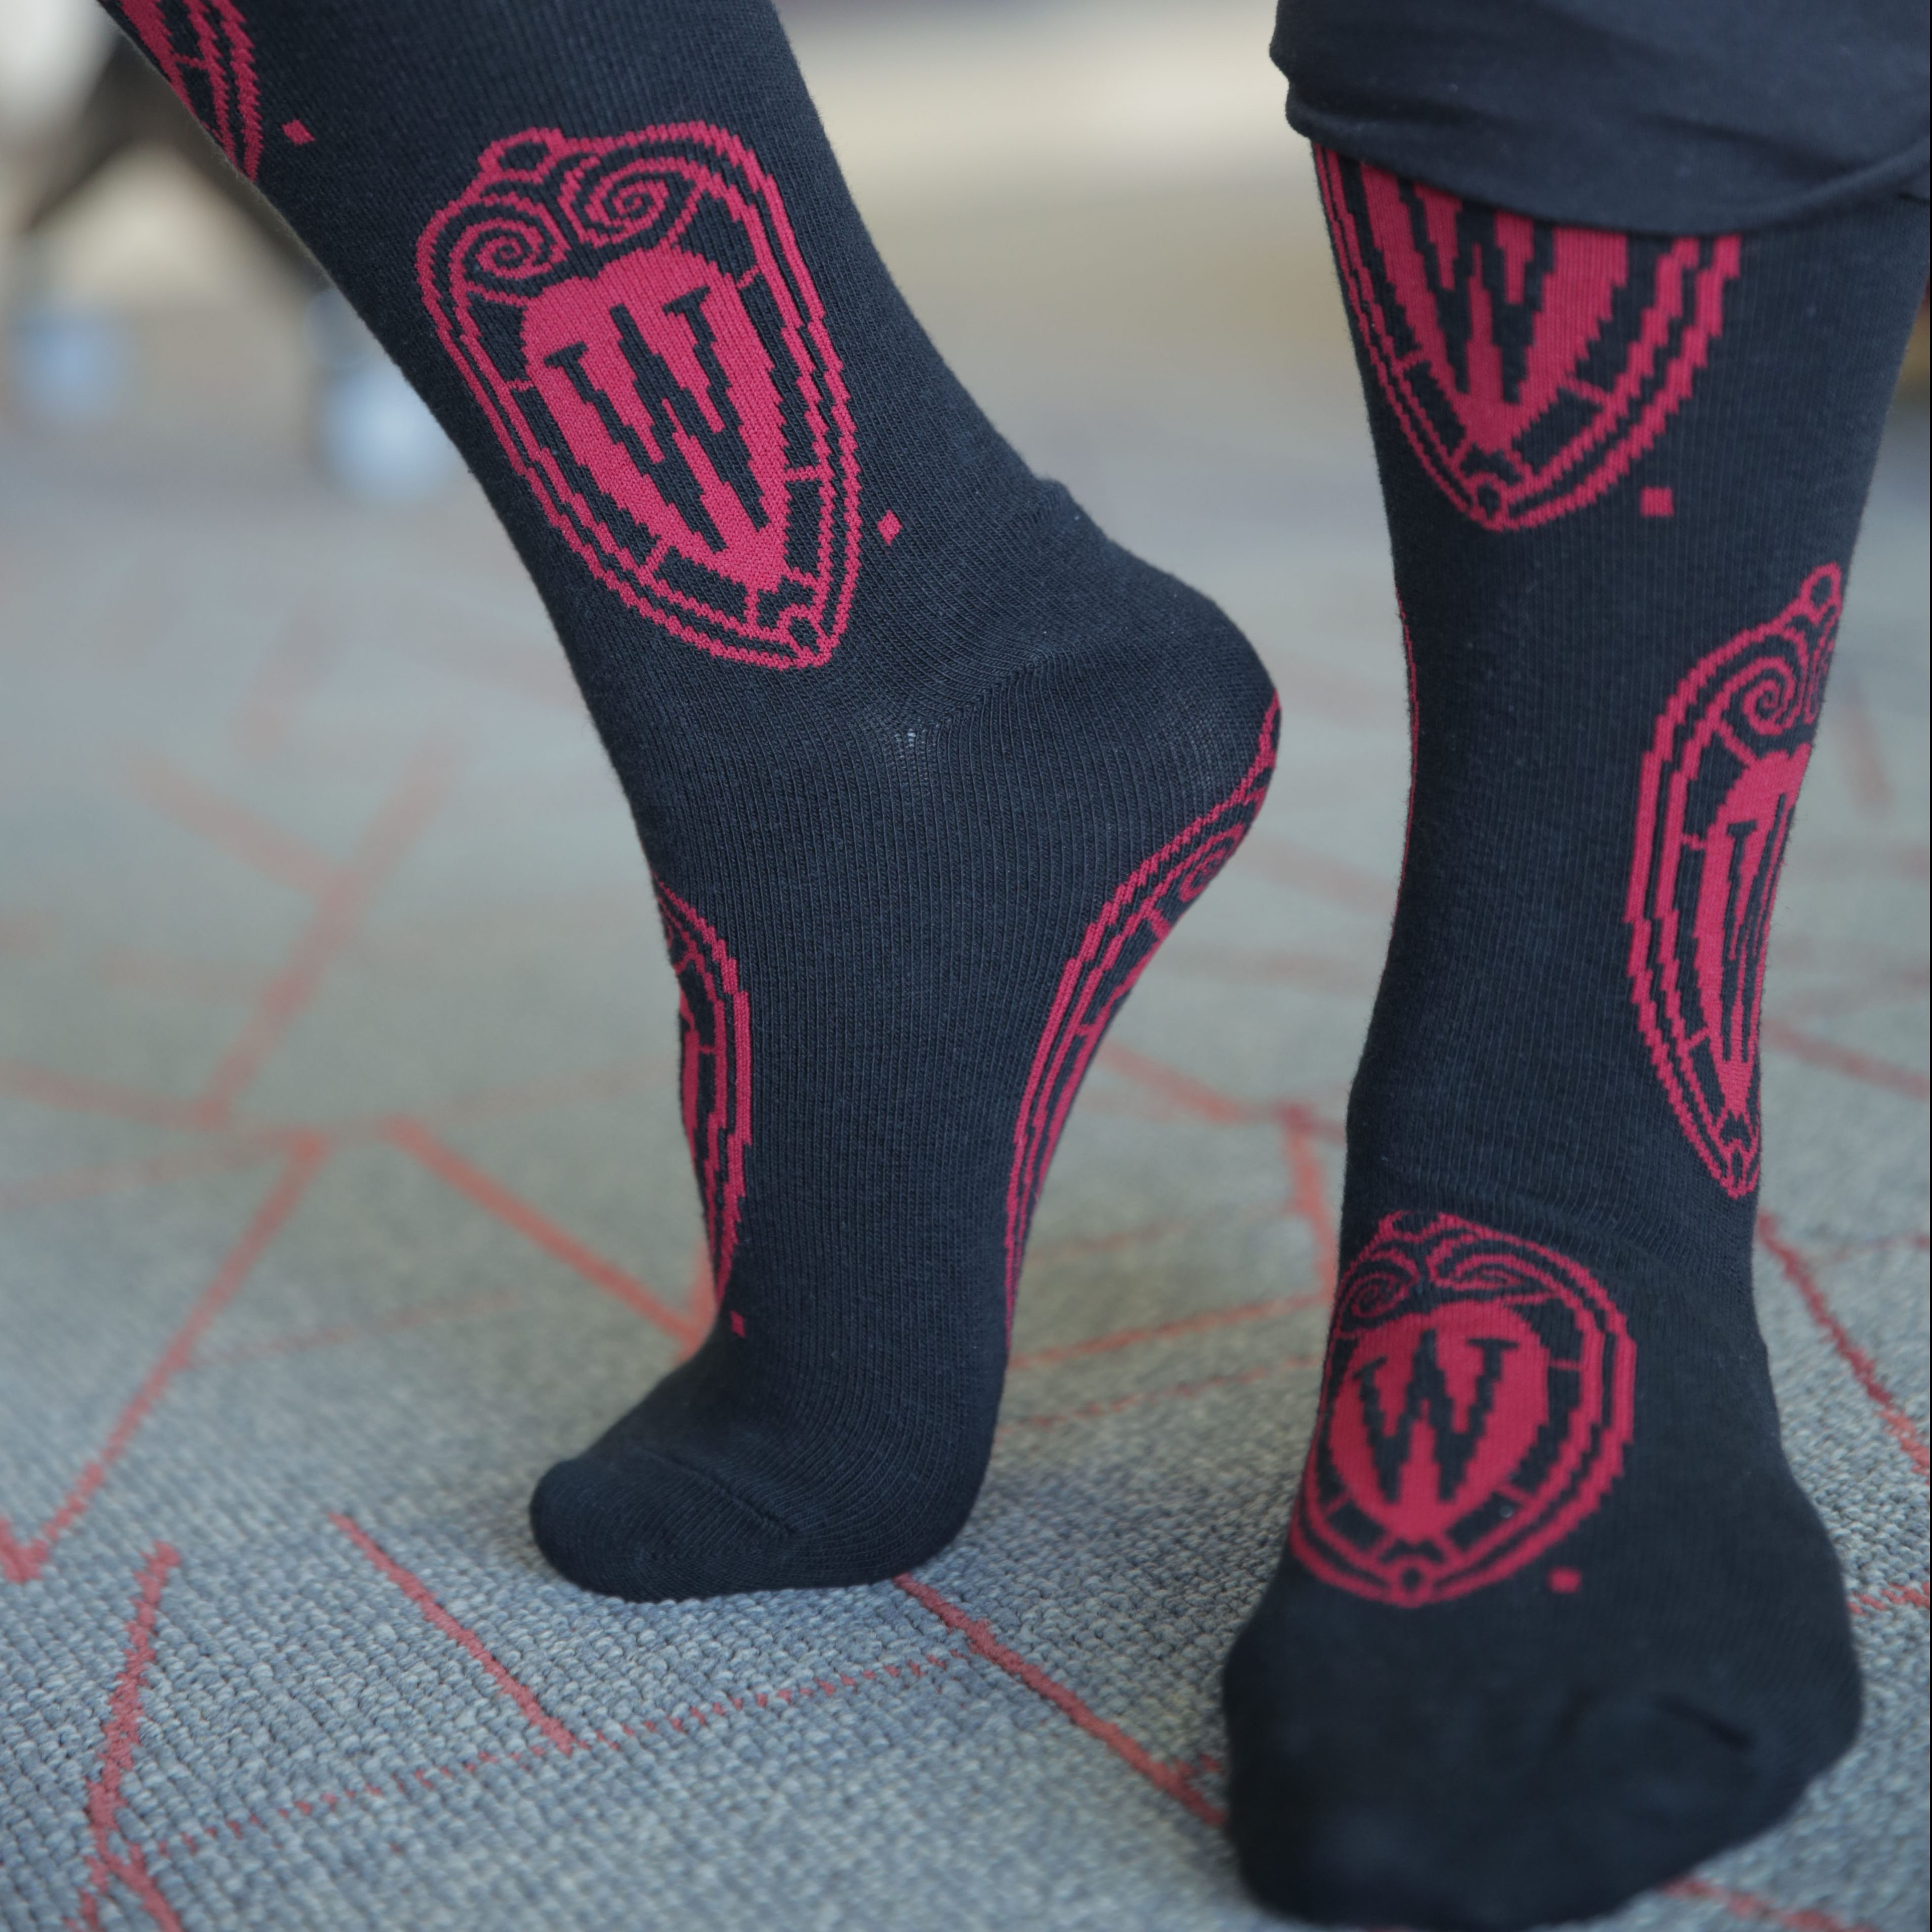 Photo of W crest socks on a model's feet